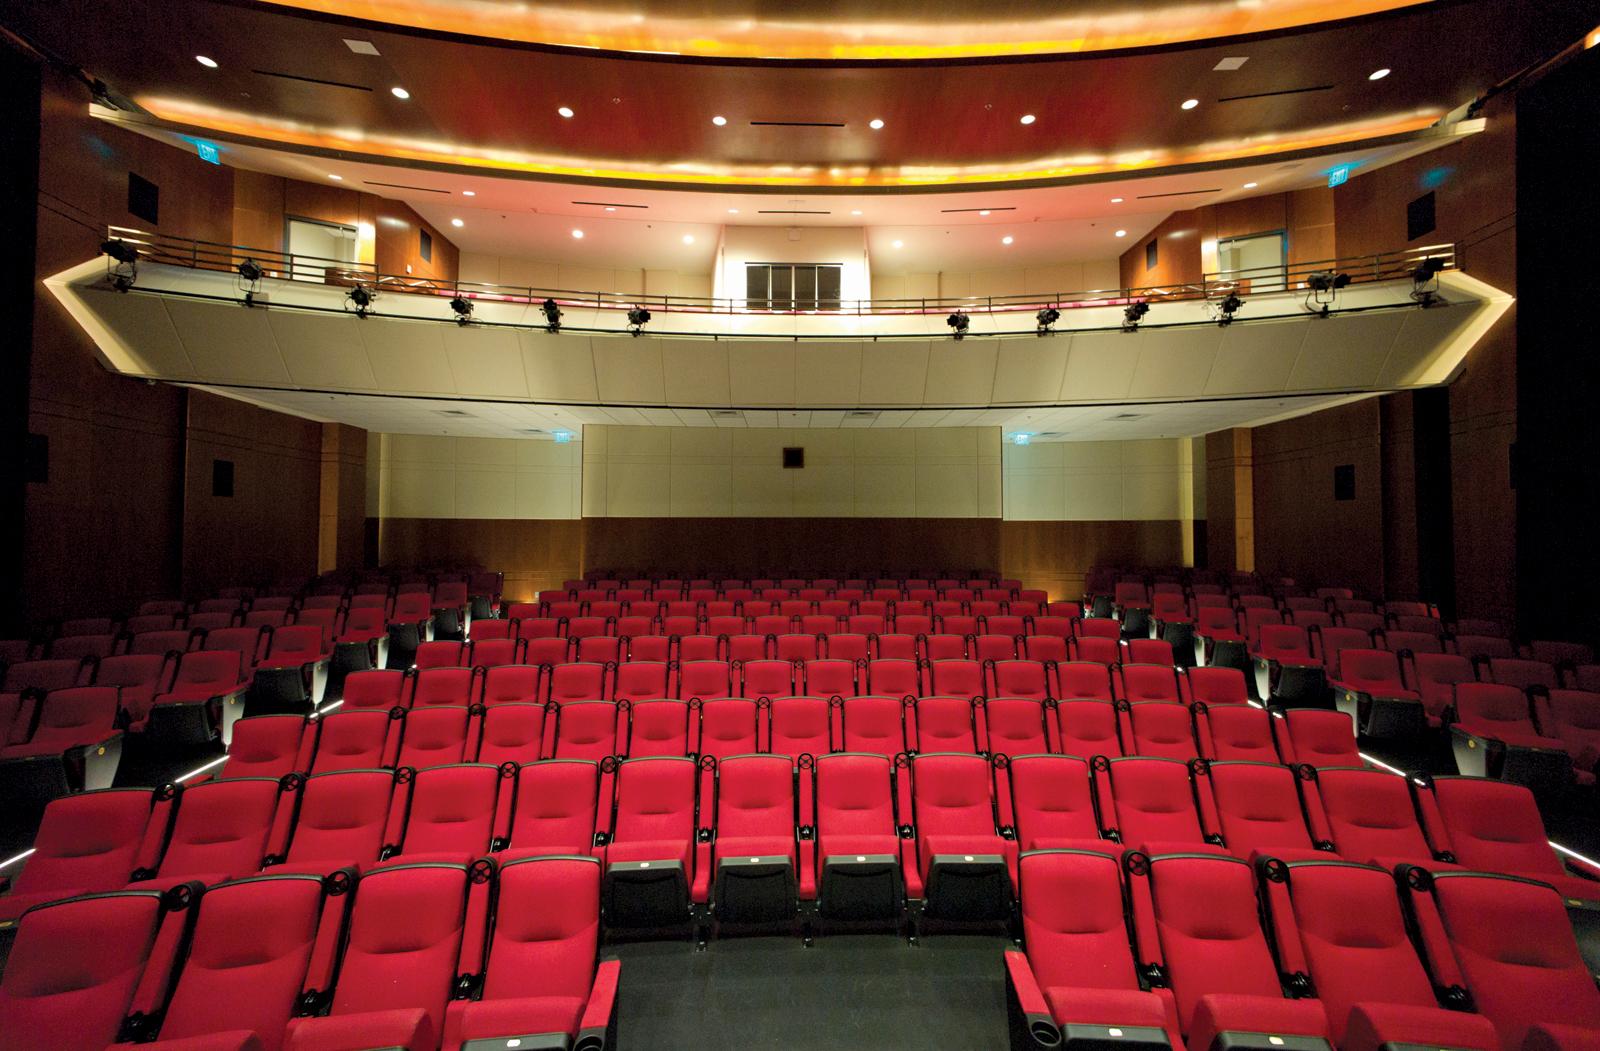 Ron Robinson Theater Auditorium (Photo courtesy of the Ron Robinson Theater)